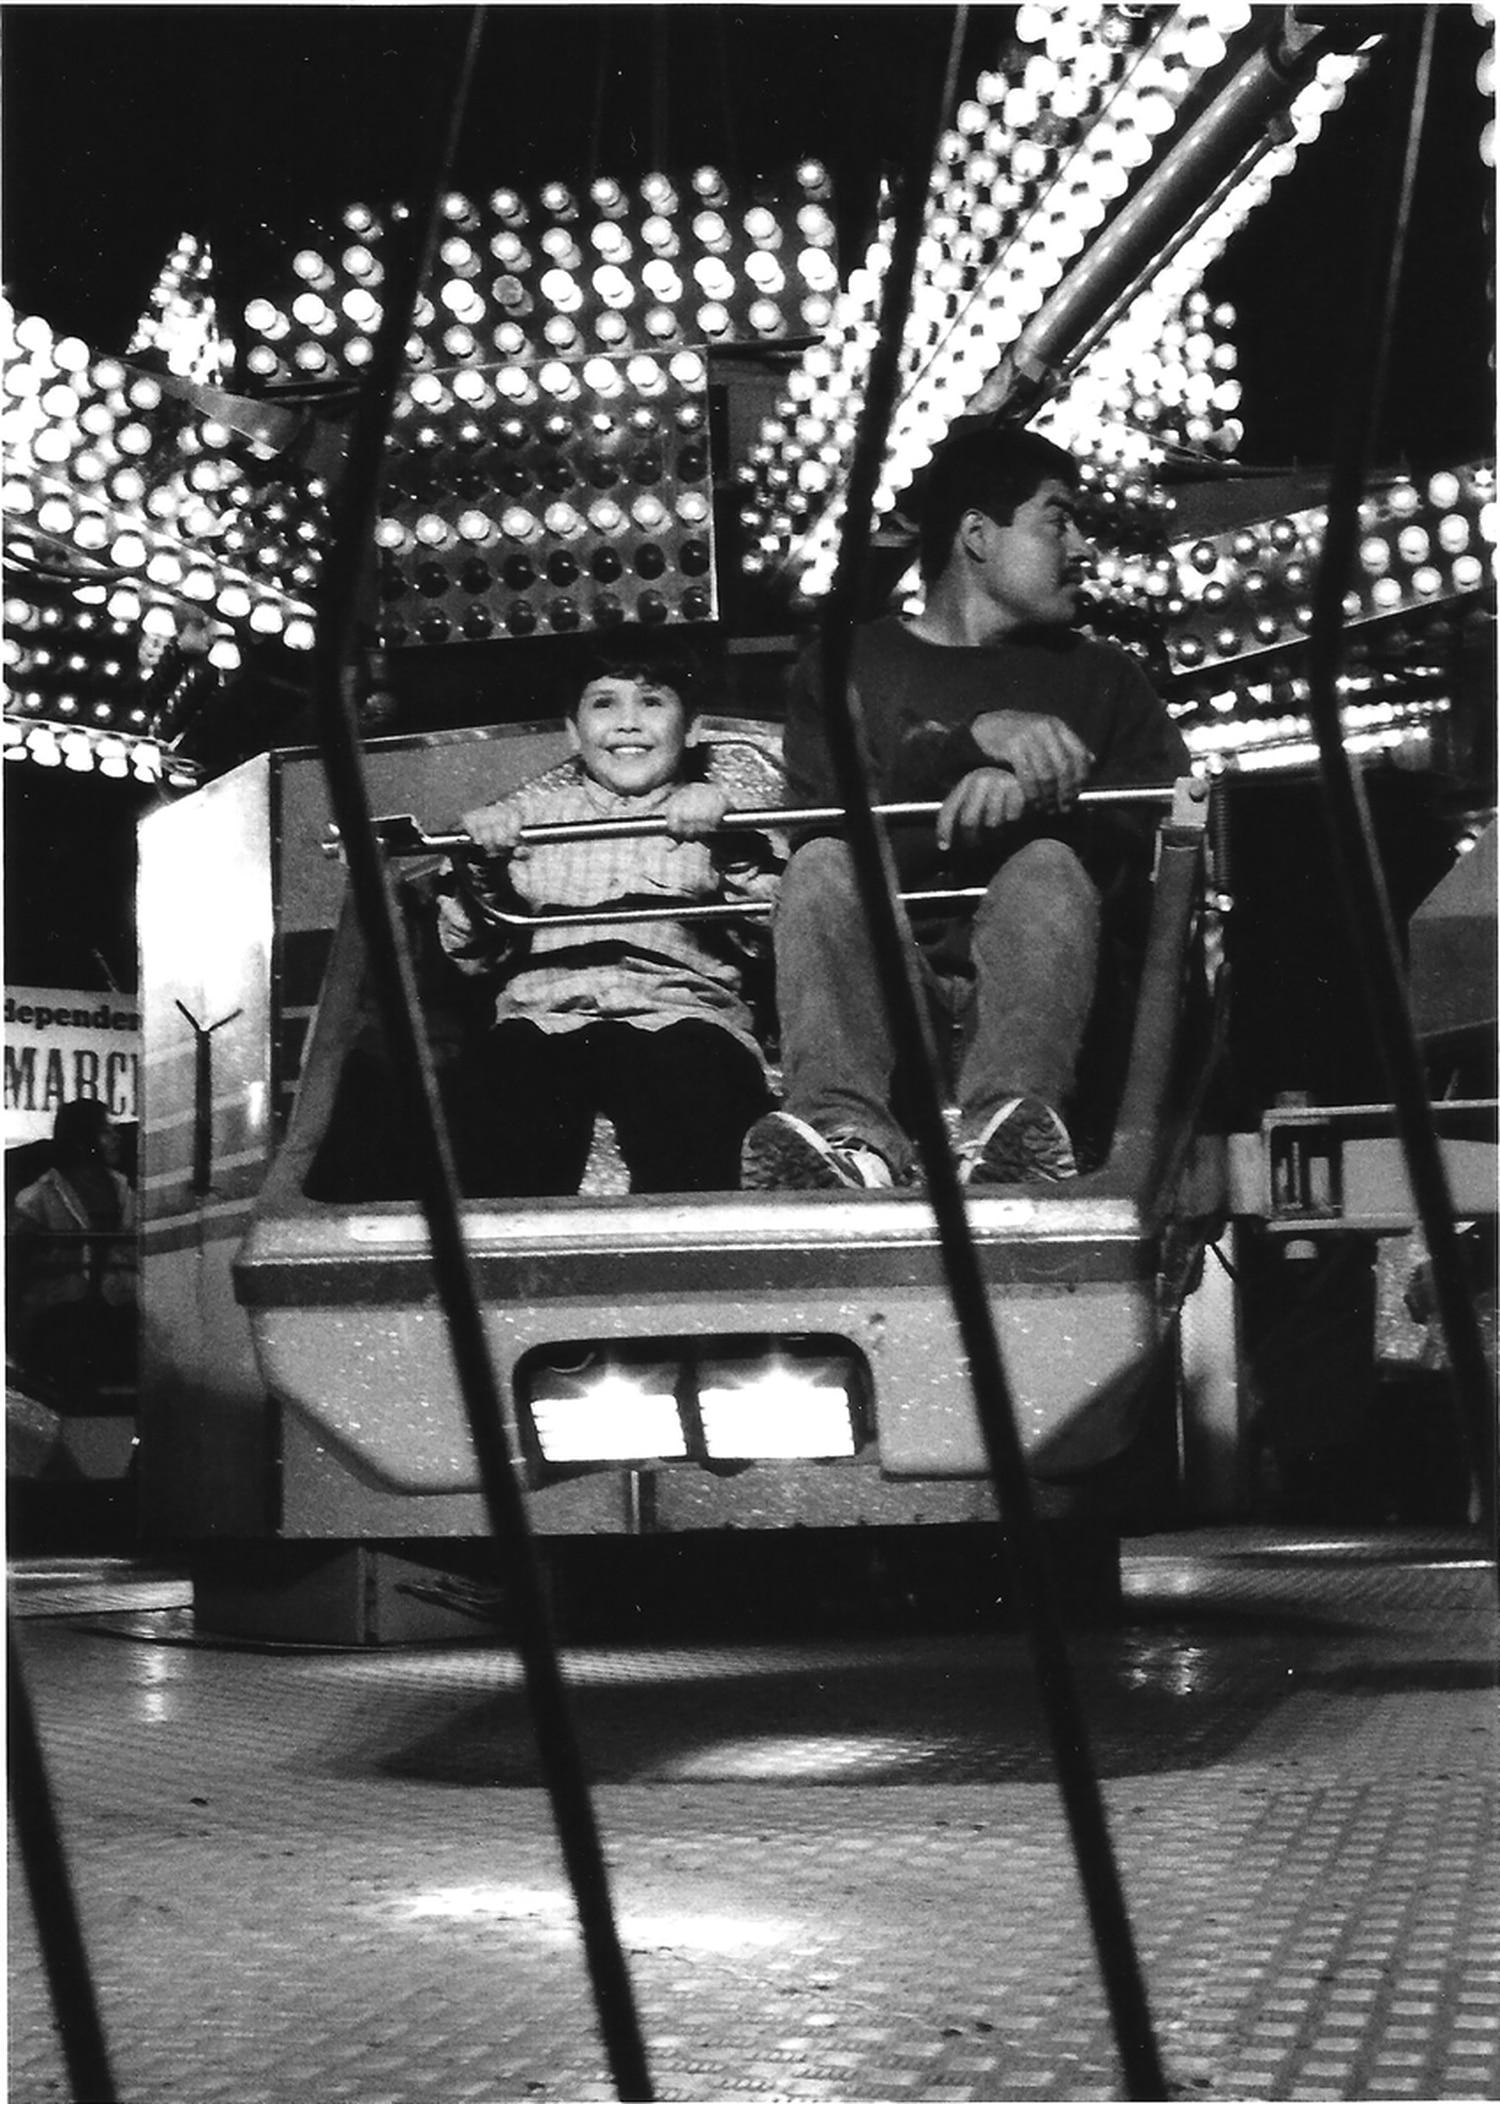 Feria |Villa Linda Mall, 1998